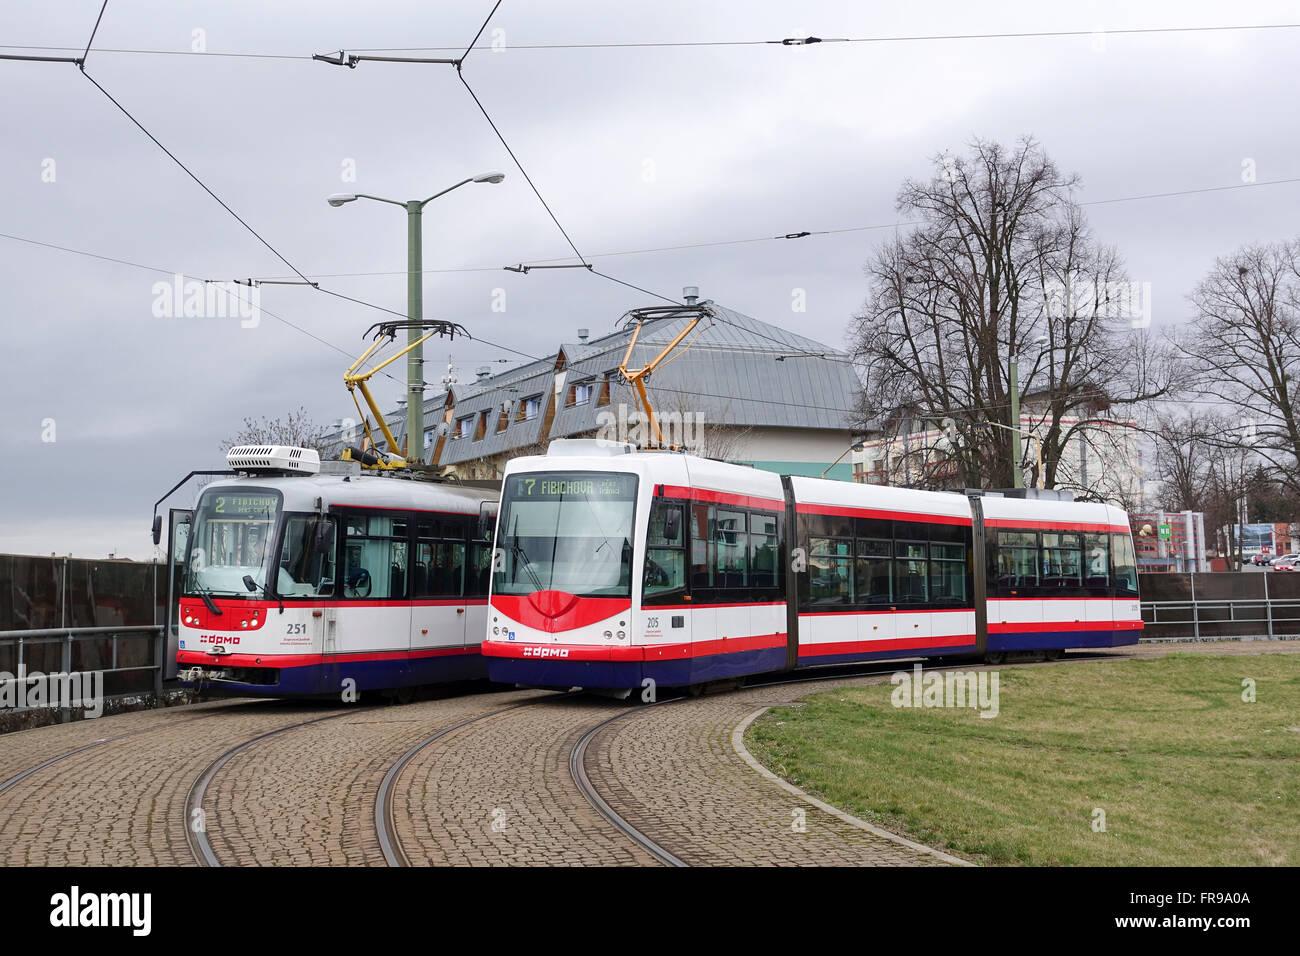 Olomouc Trams at Fibichour Balloon Loop Czech Republic - Stock Image